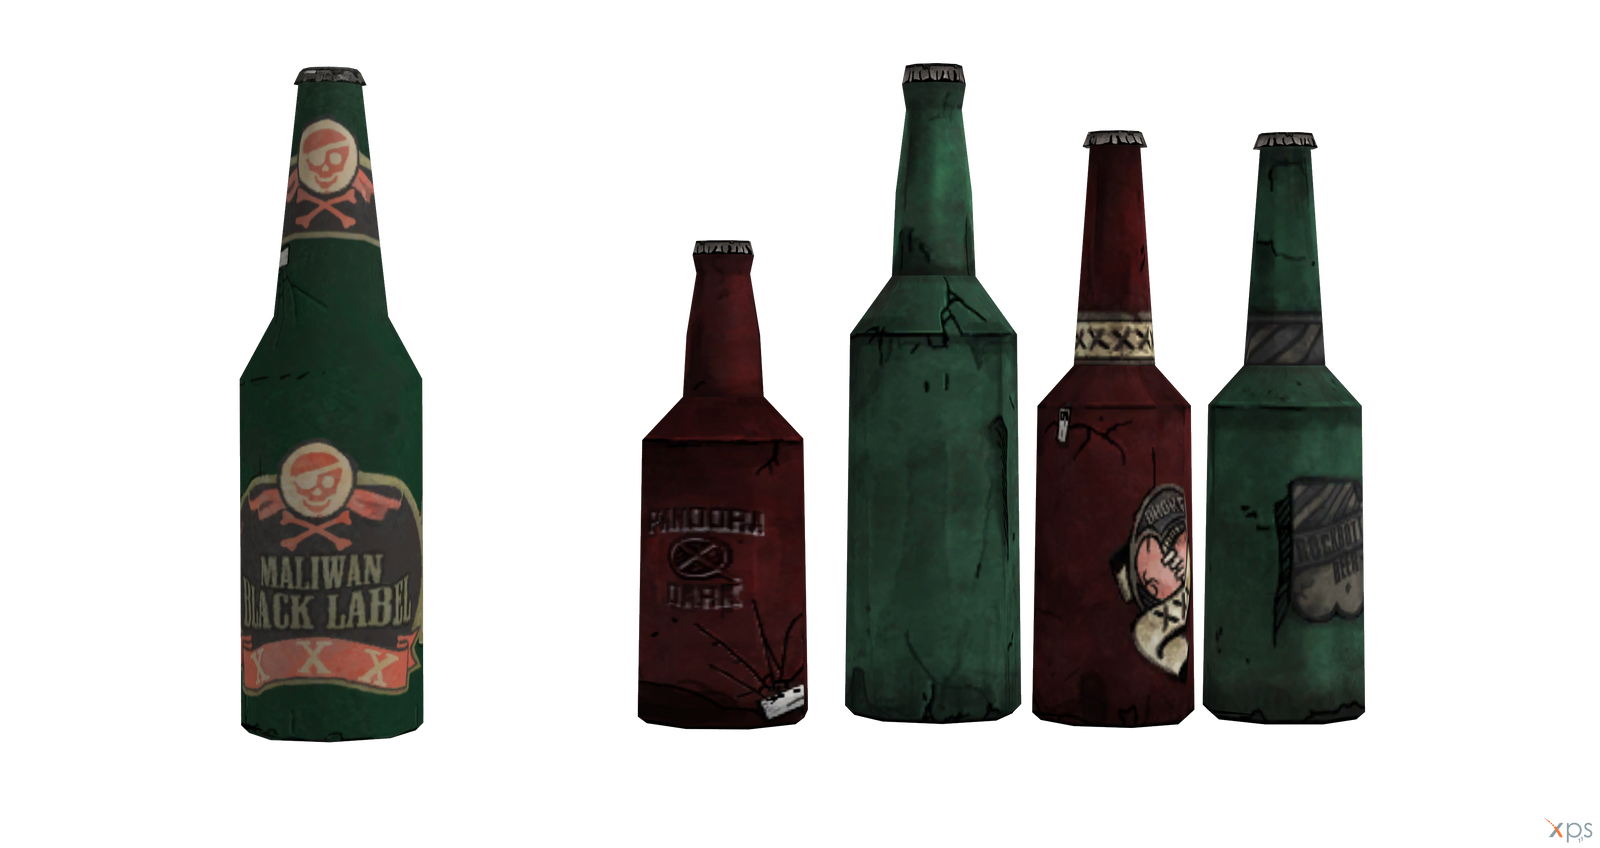 Borderlands 2 Xnalara model: Beer and Beer set by branch-san